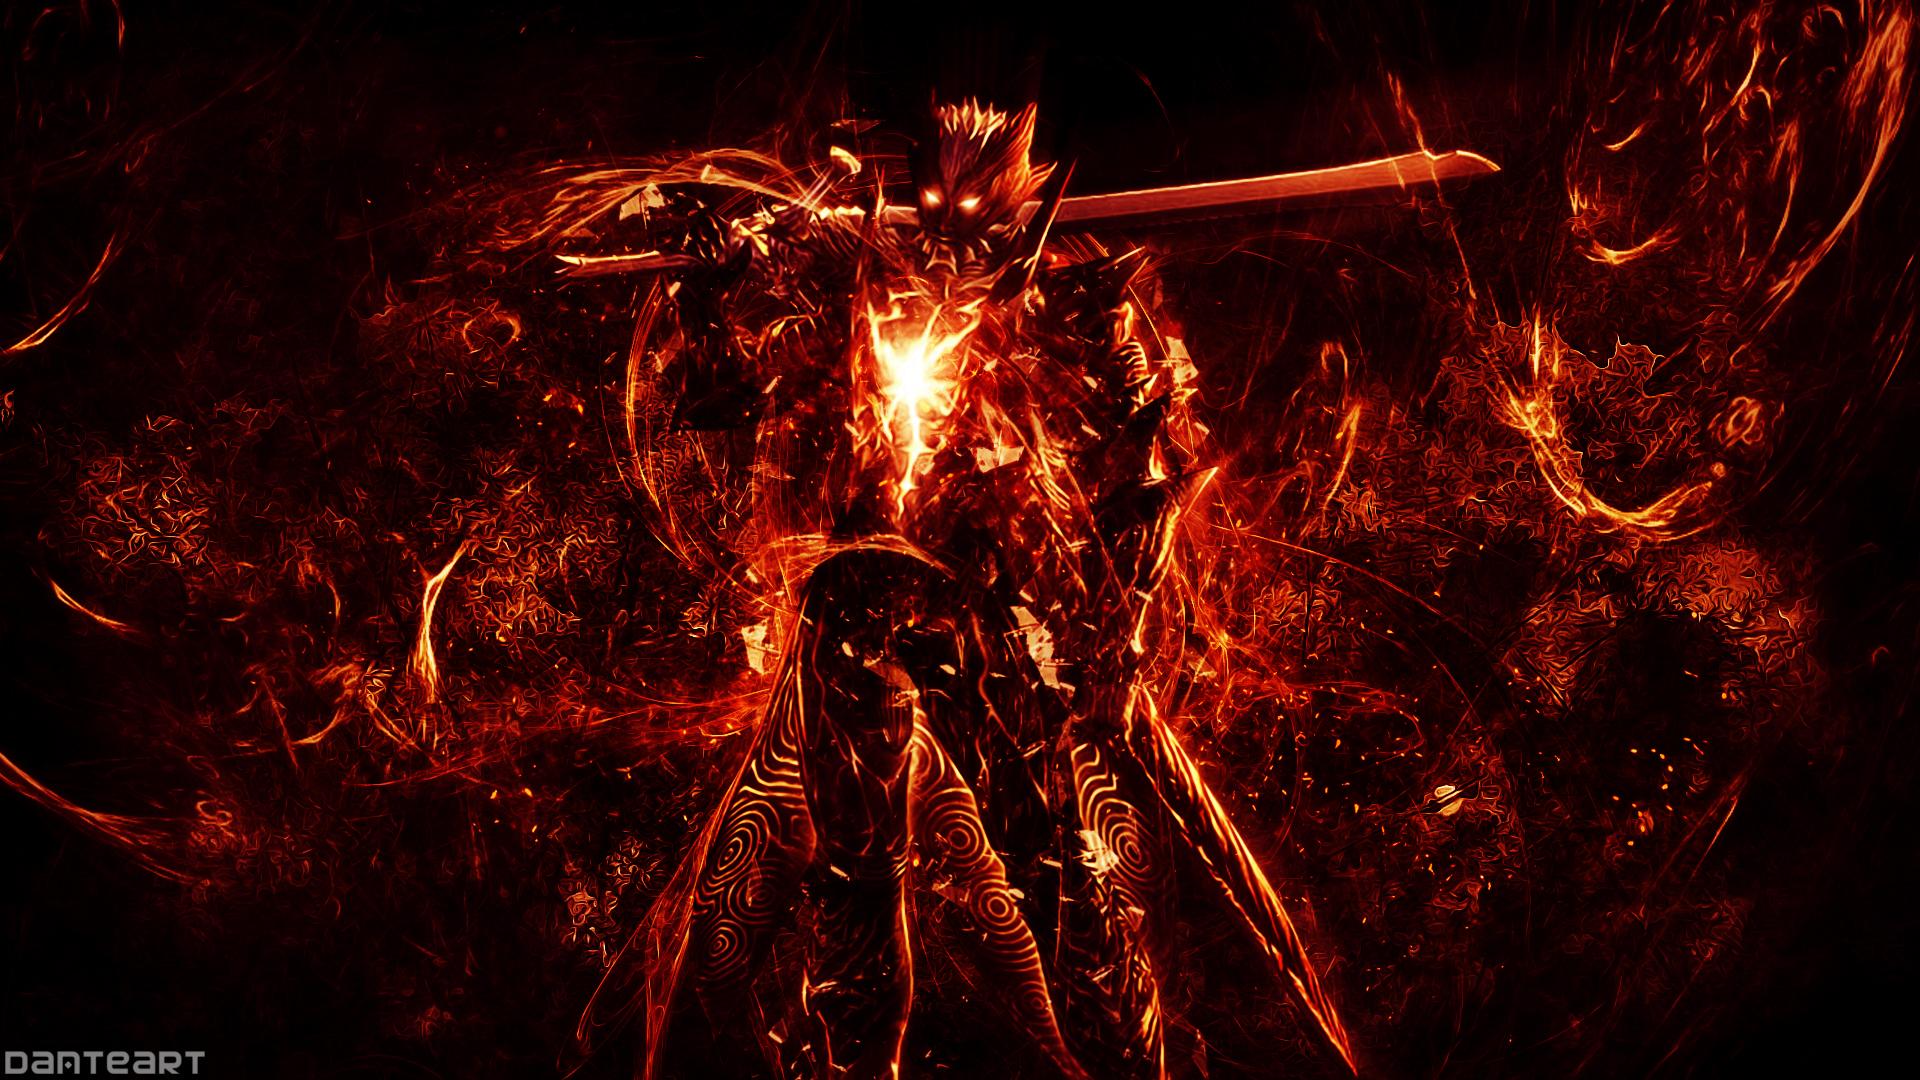 Devil May Cry Dante Wallpaper: Devil May Cry Dante Demon Form Wallpaper